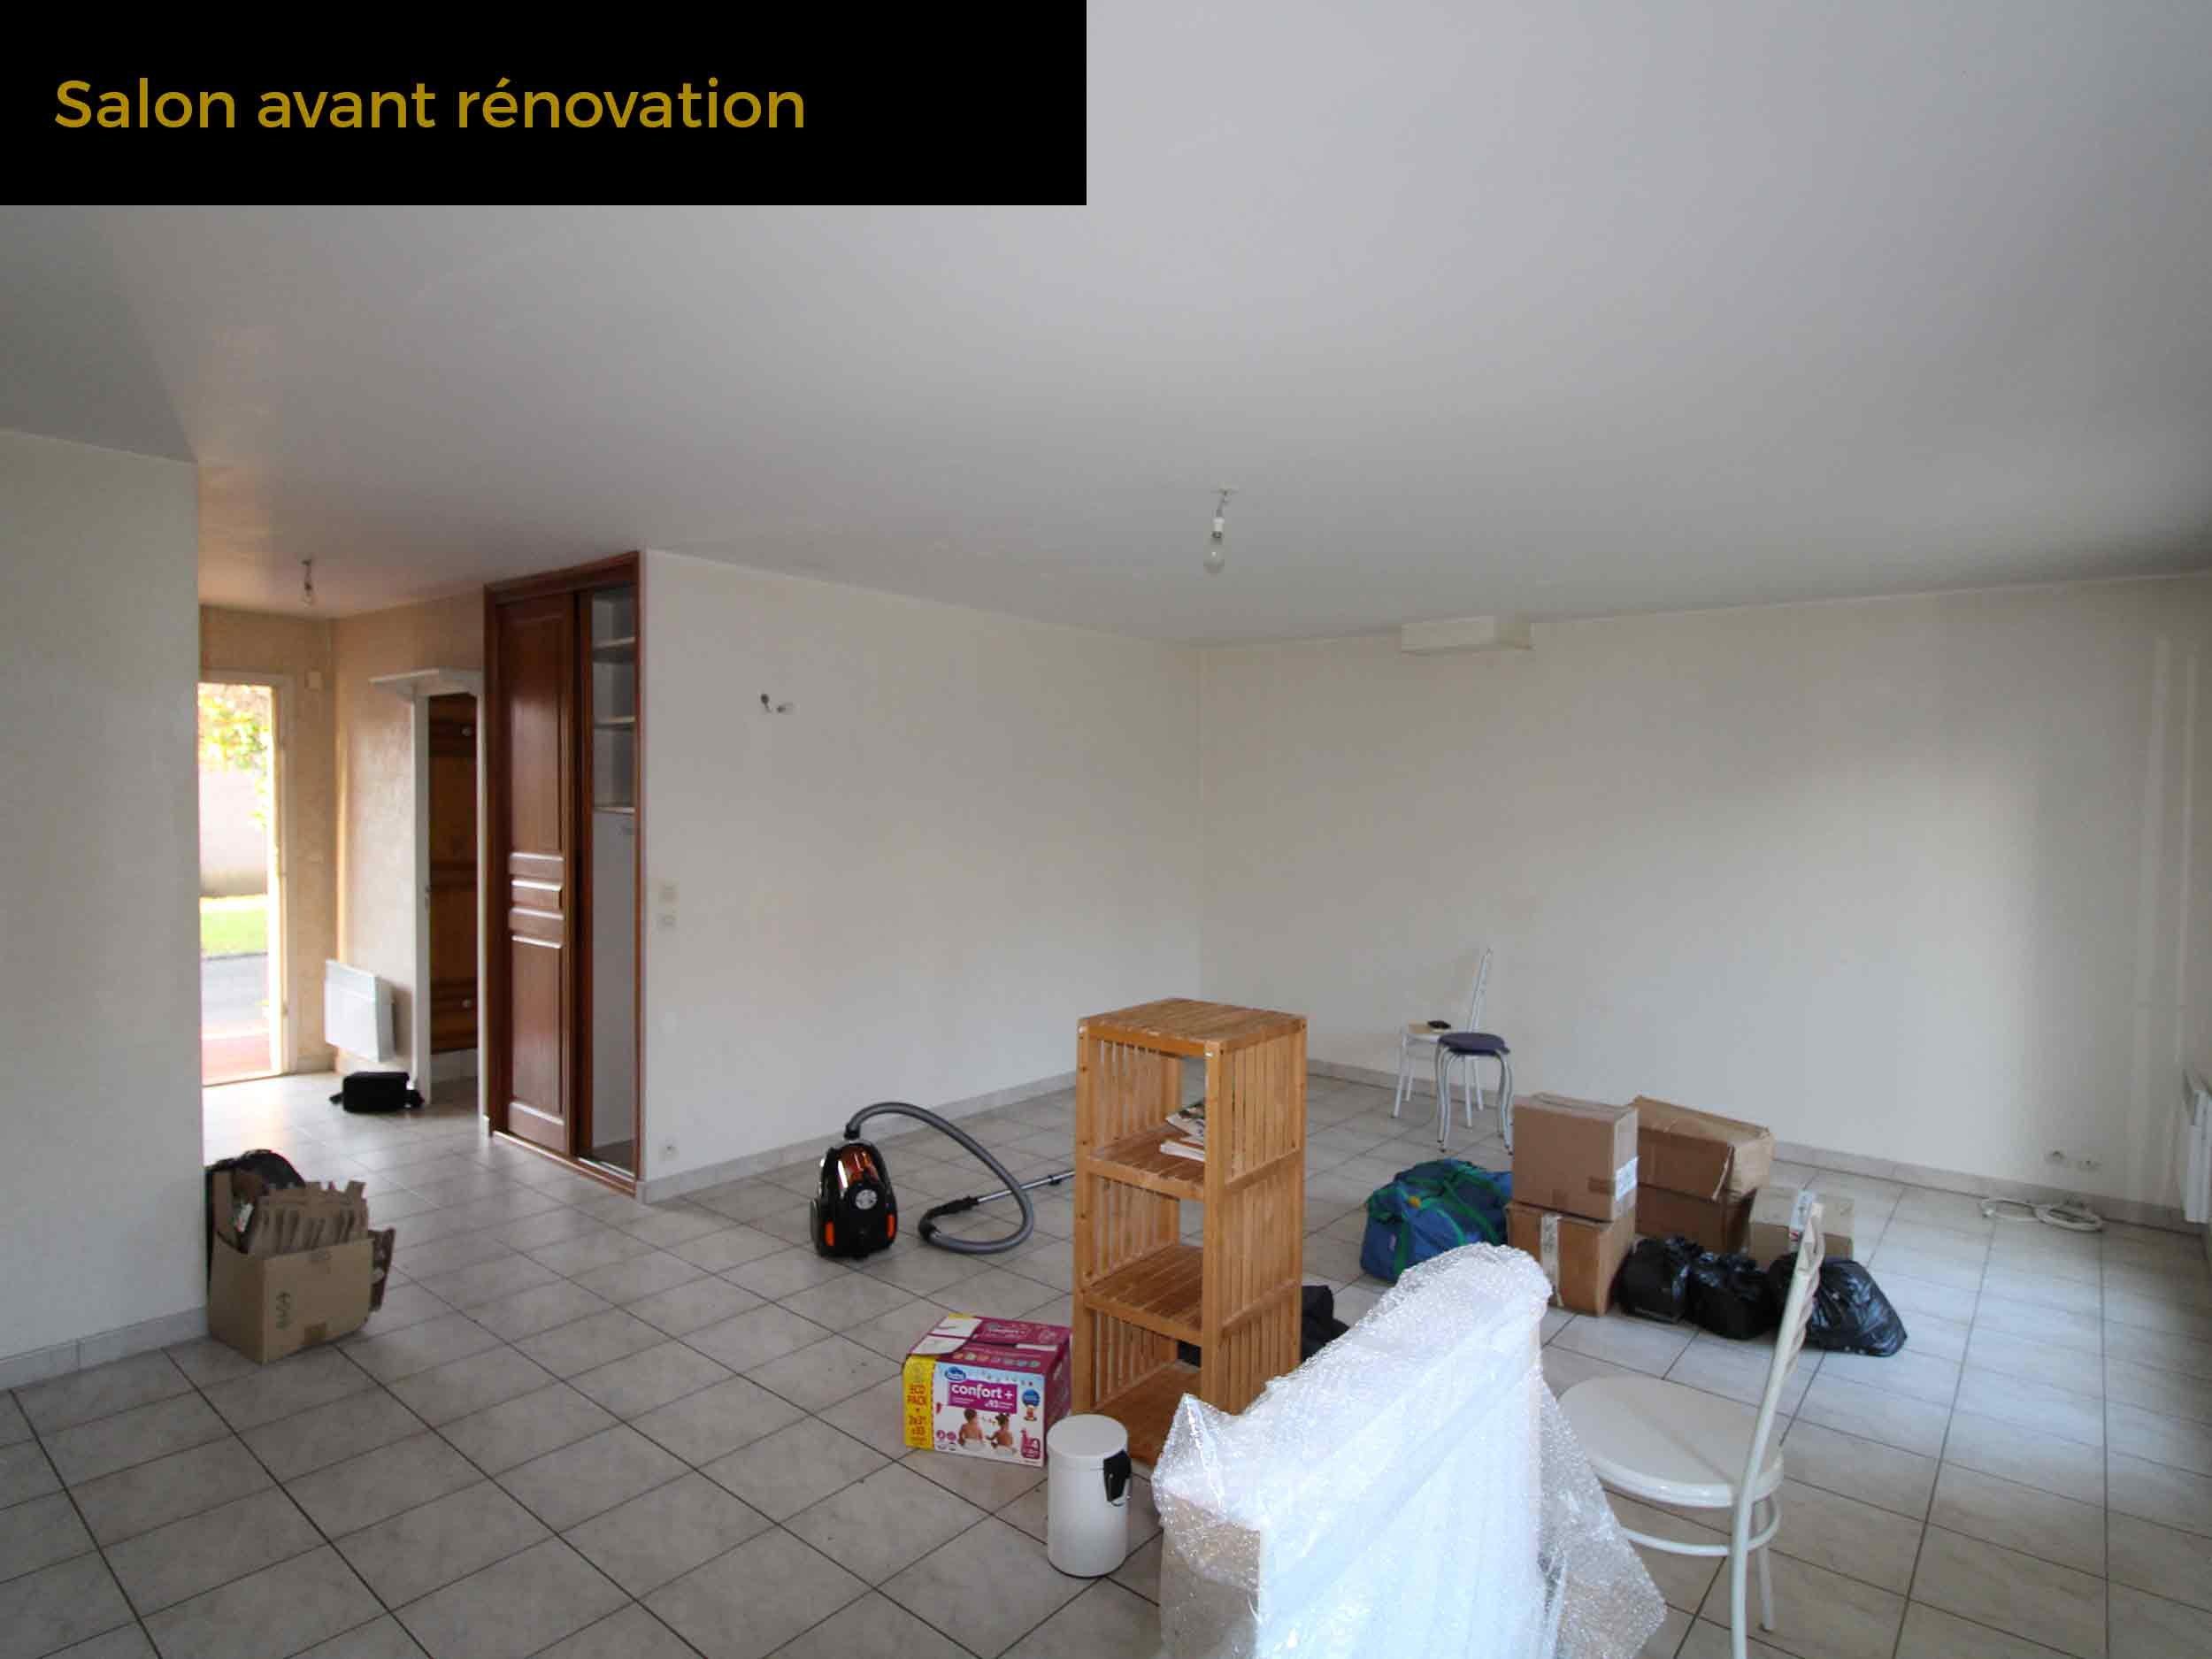 1-salon-avant-renovation-champagne